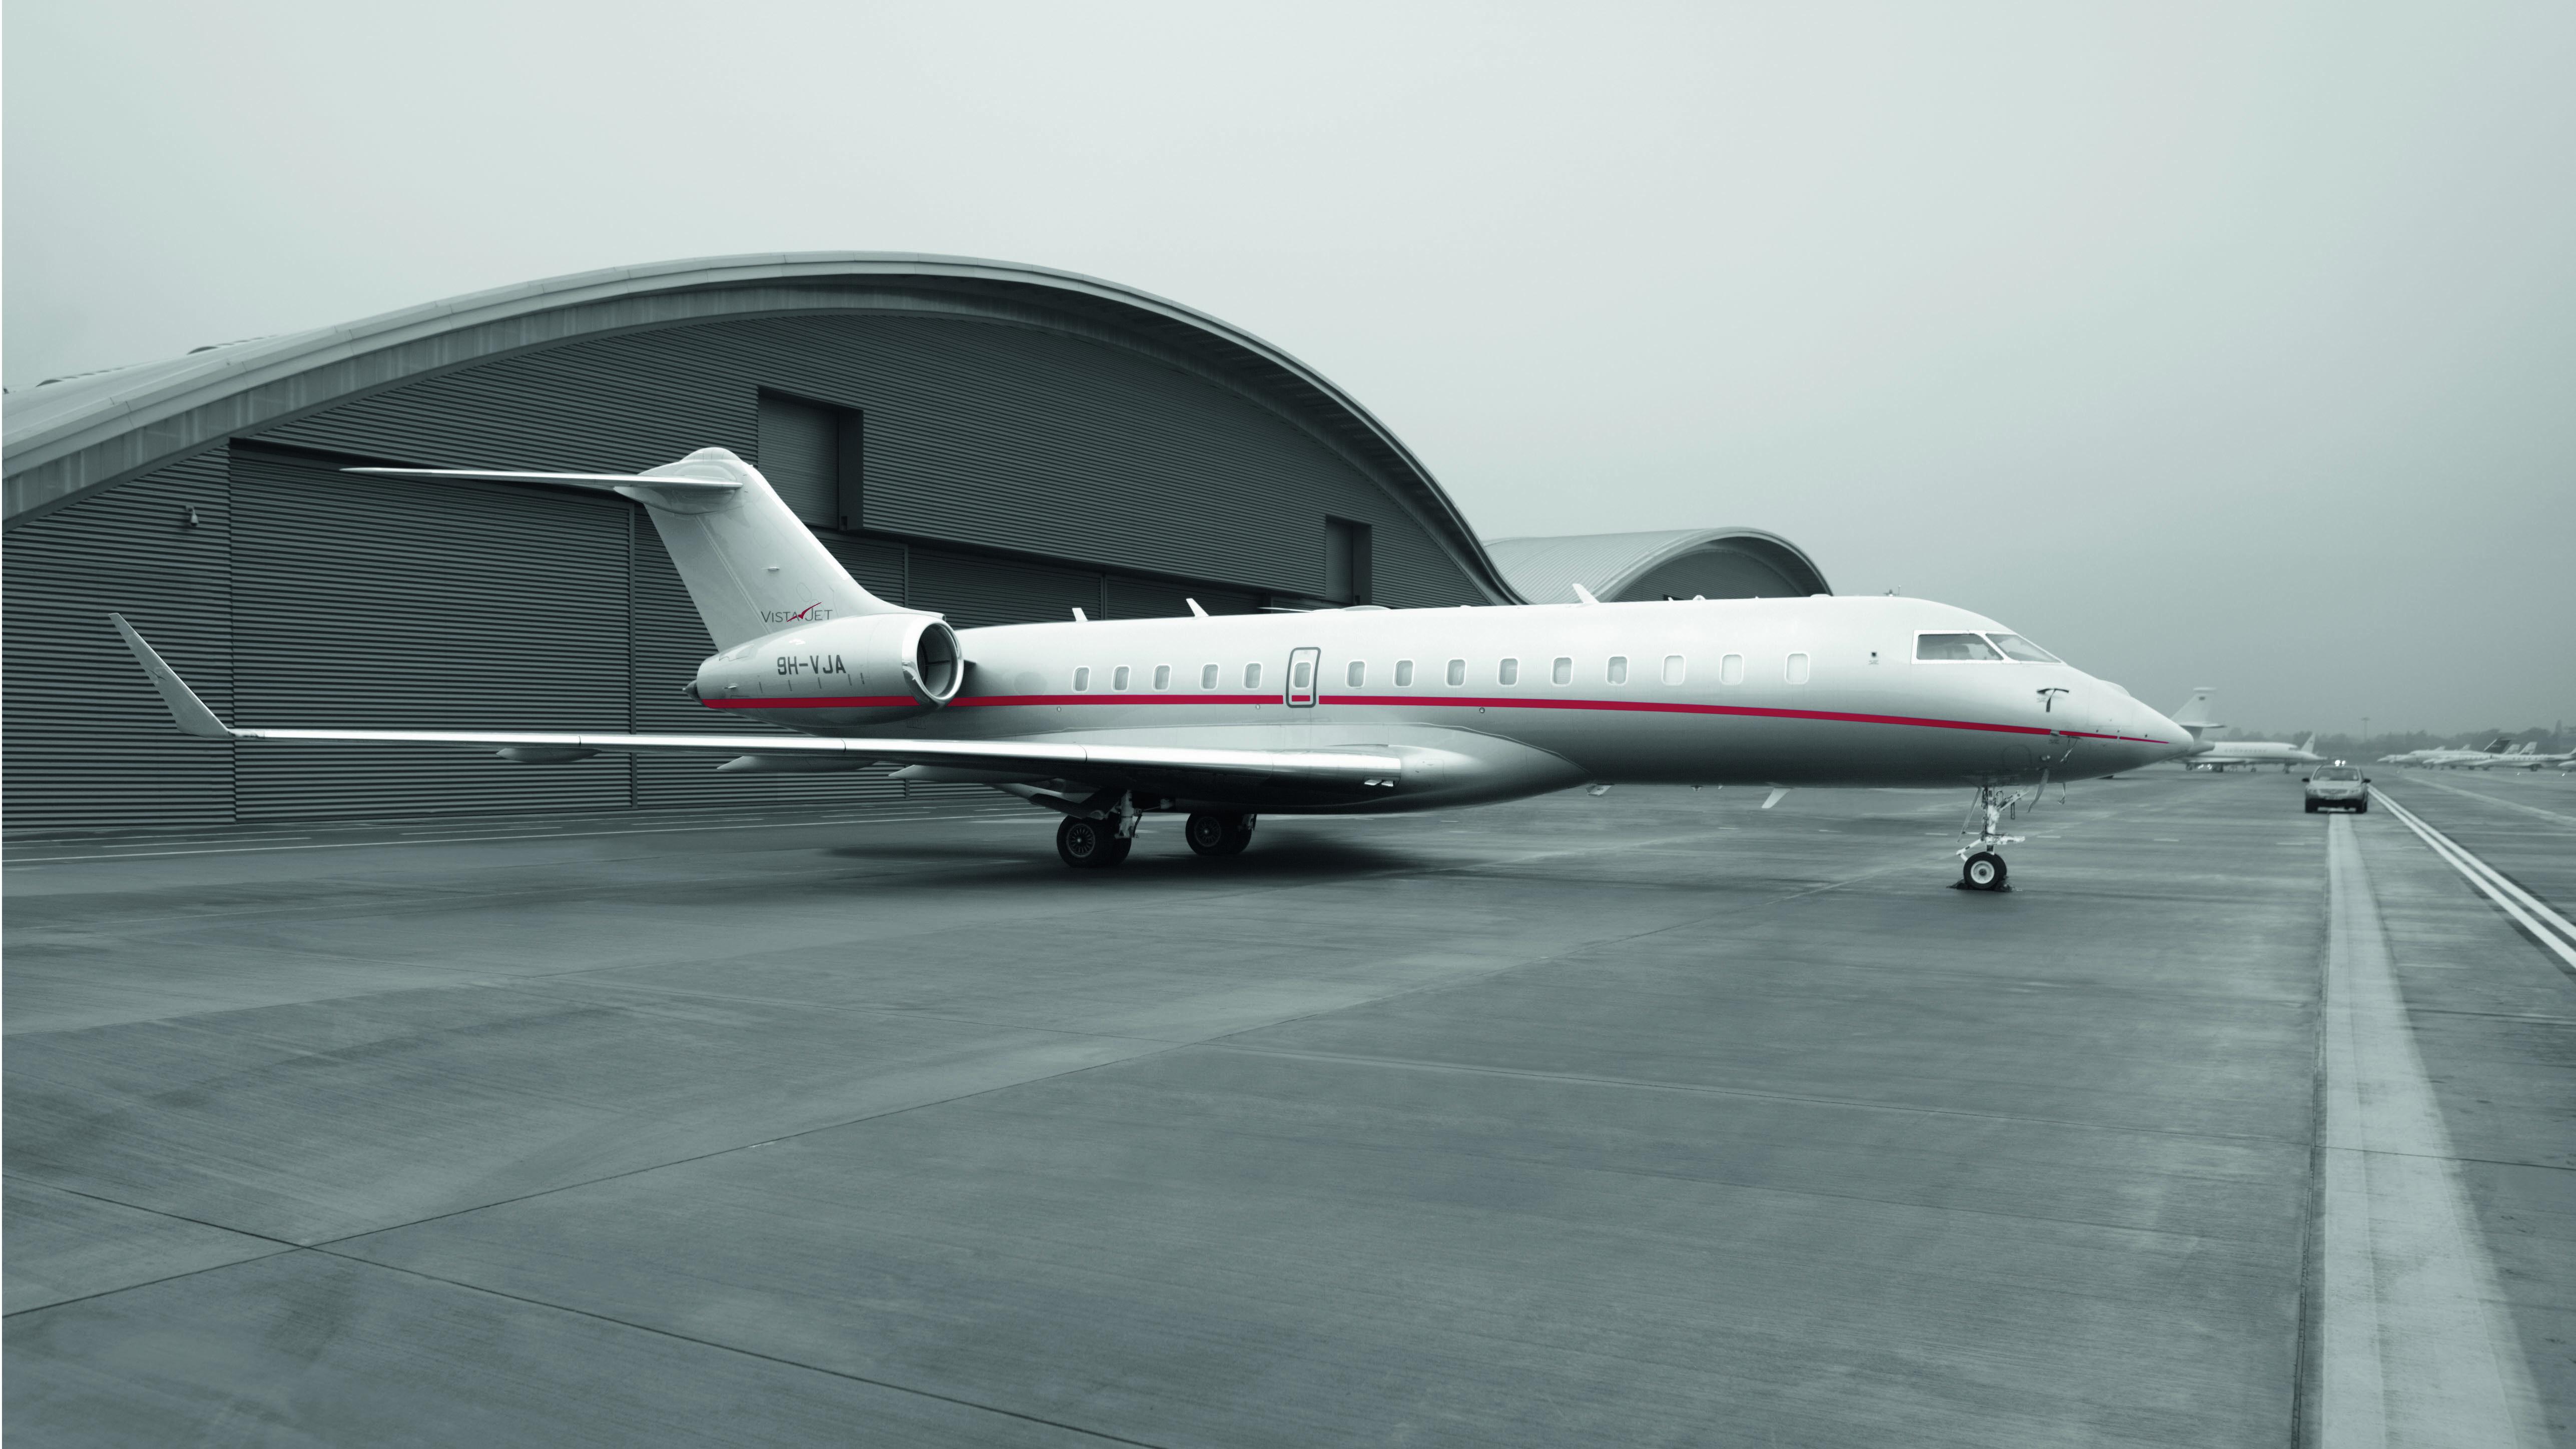 VistaJet Bombardier Global 6000 Christie's Rockefeller